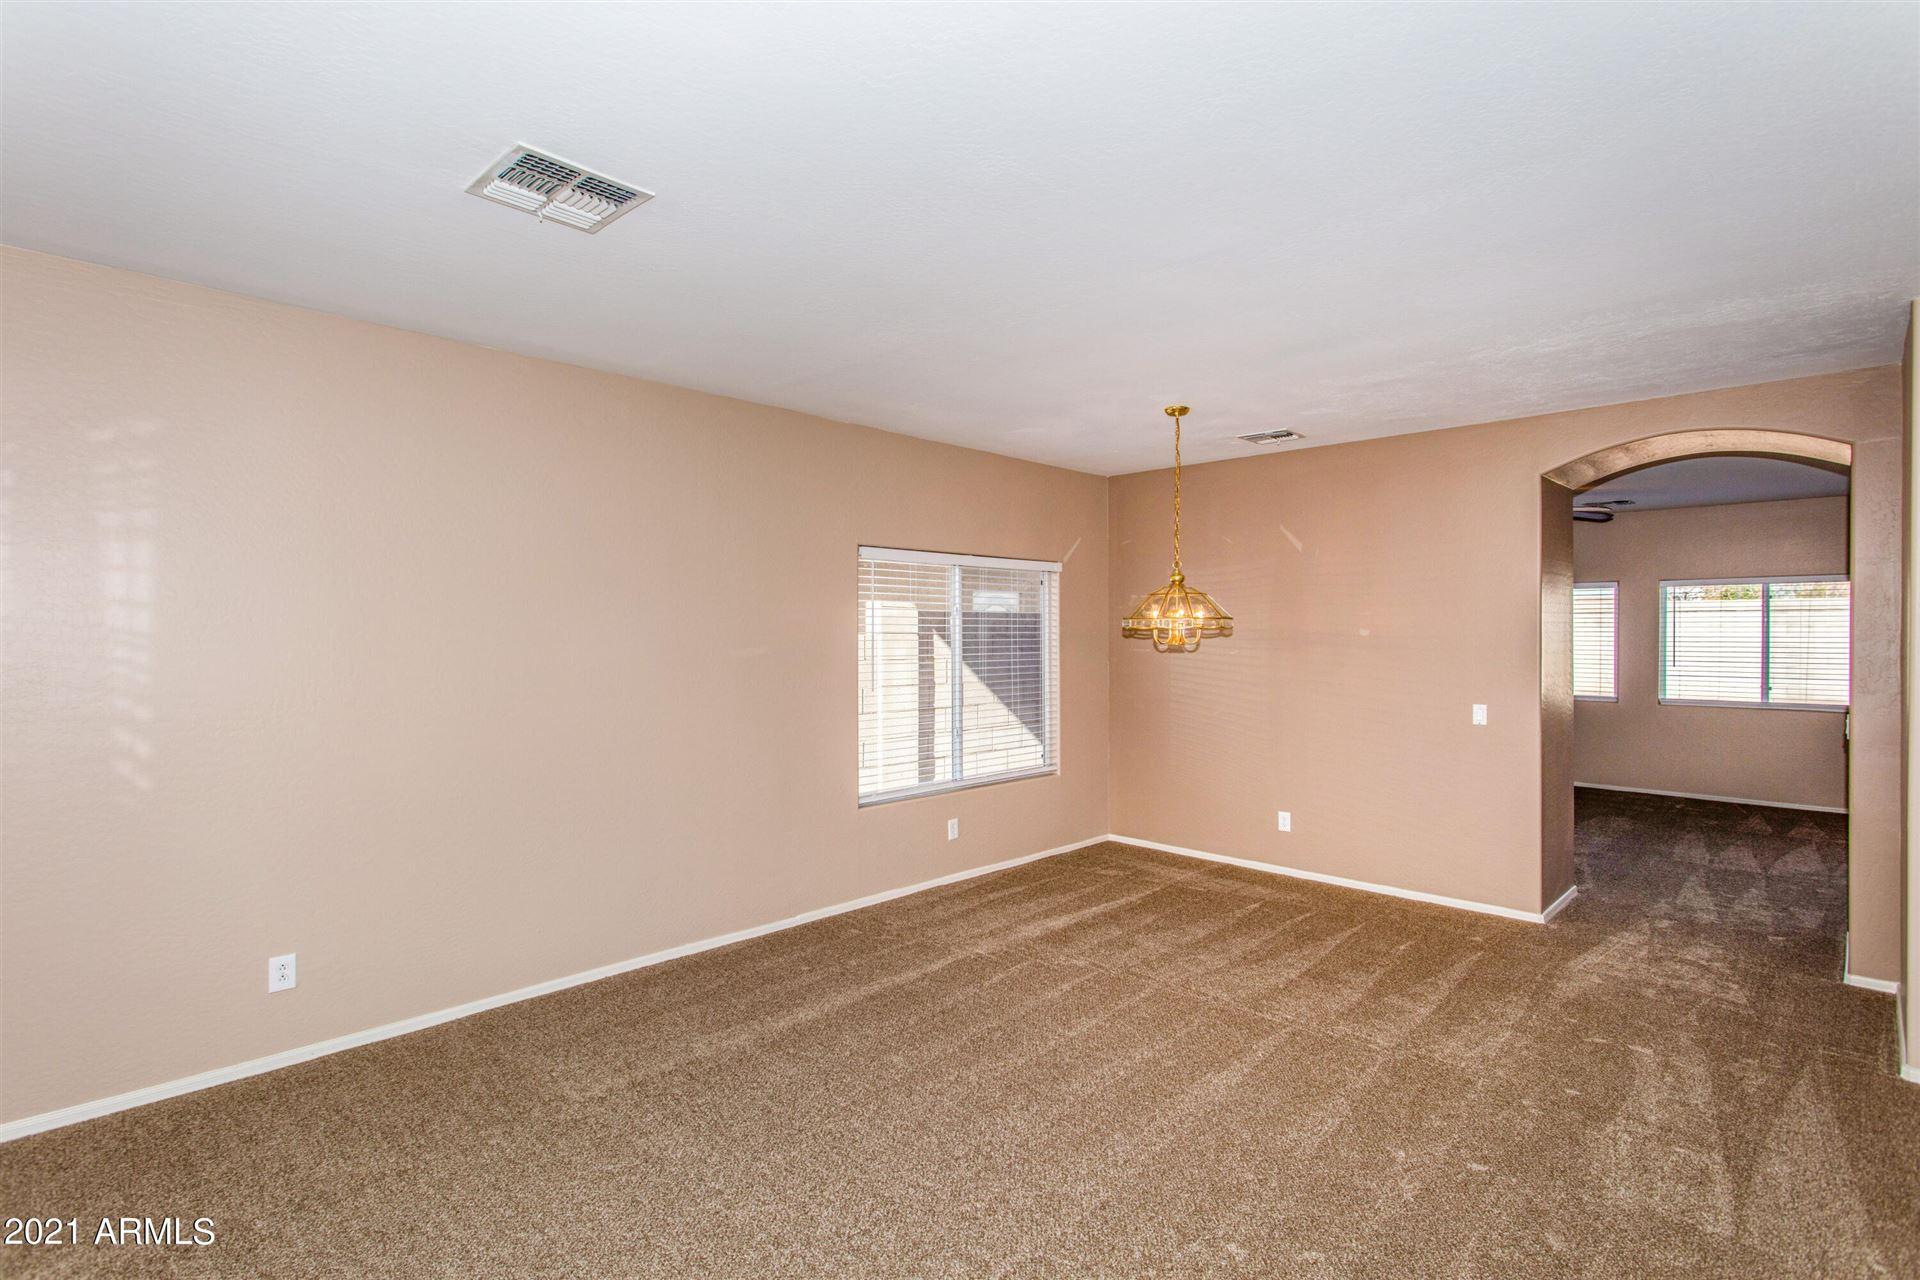 Photo of 11702 W JEFFERSON Street, Avondale, AZ 85323 (MLS # 6199996)